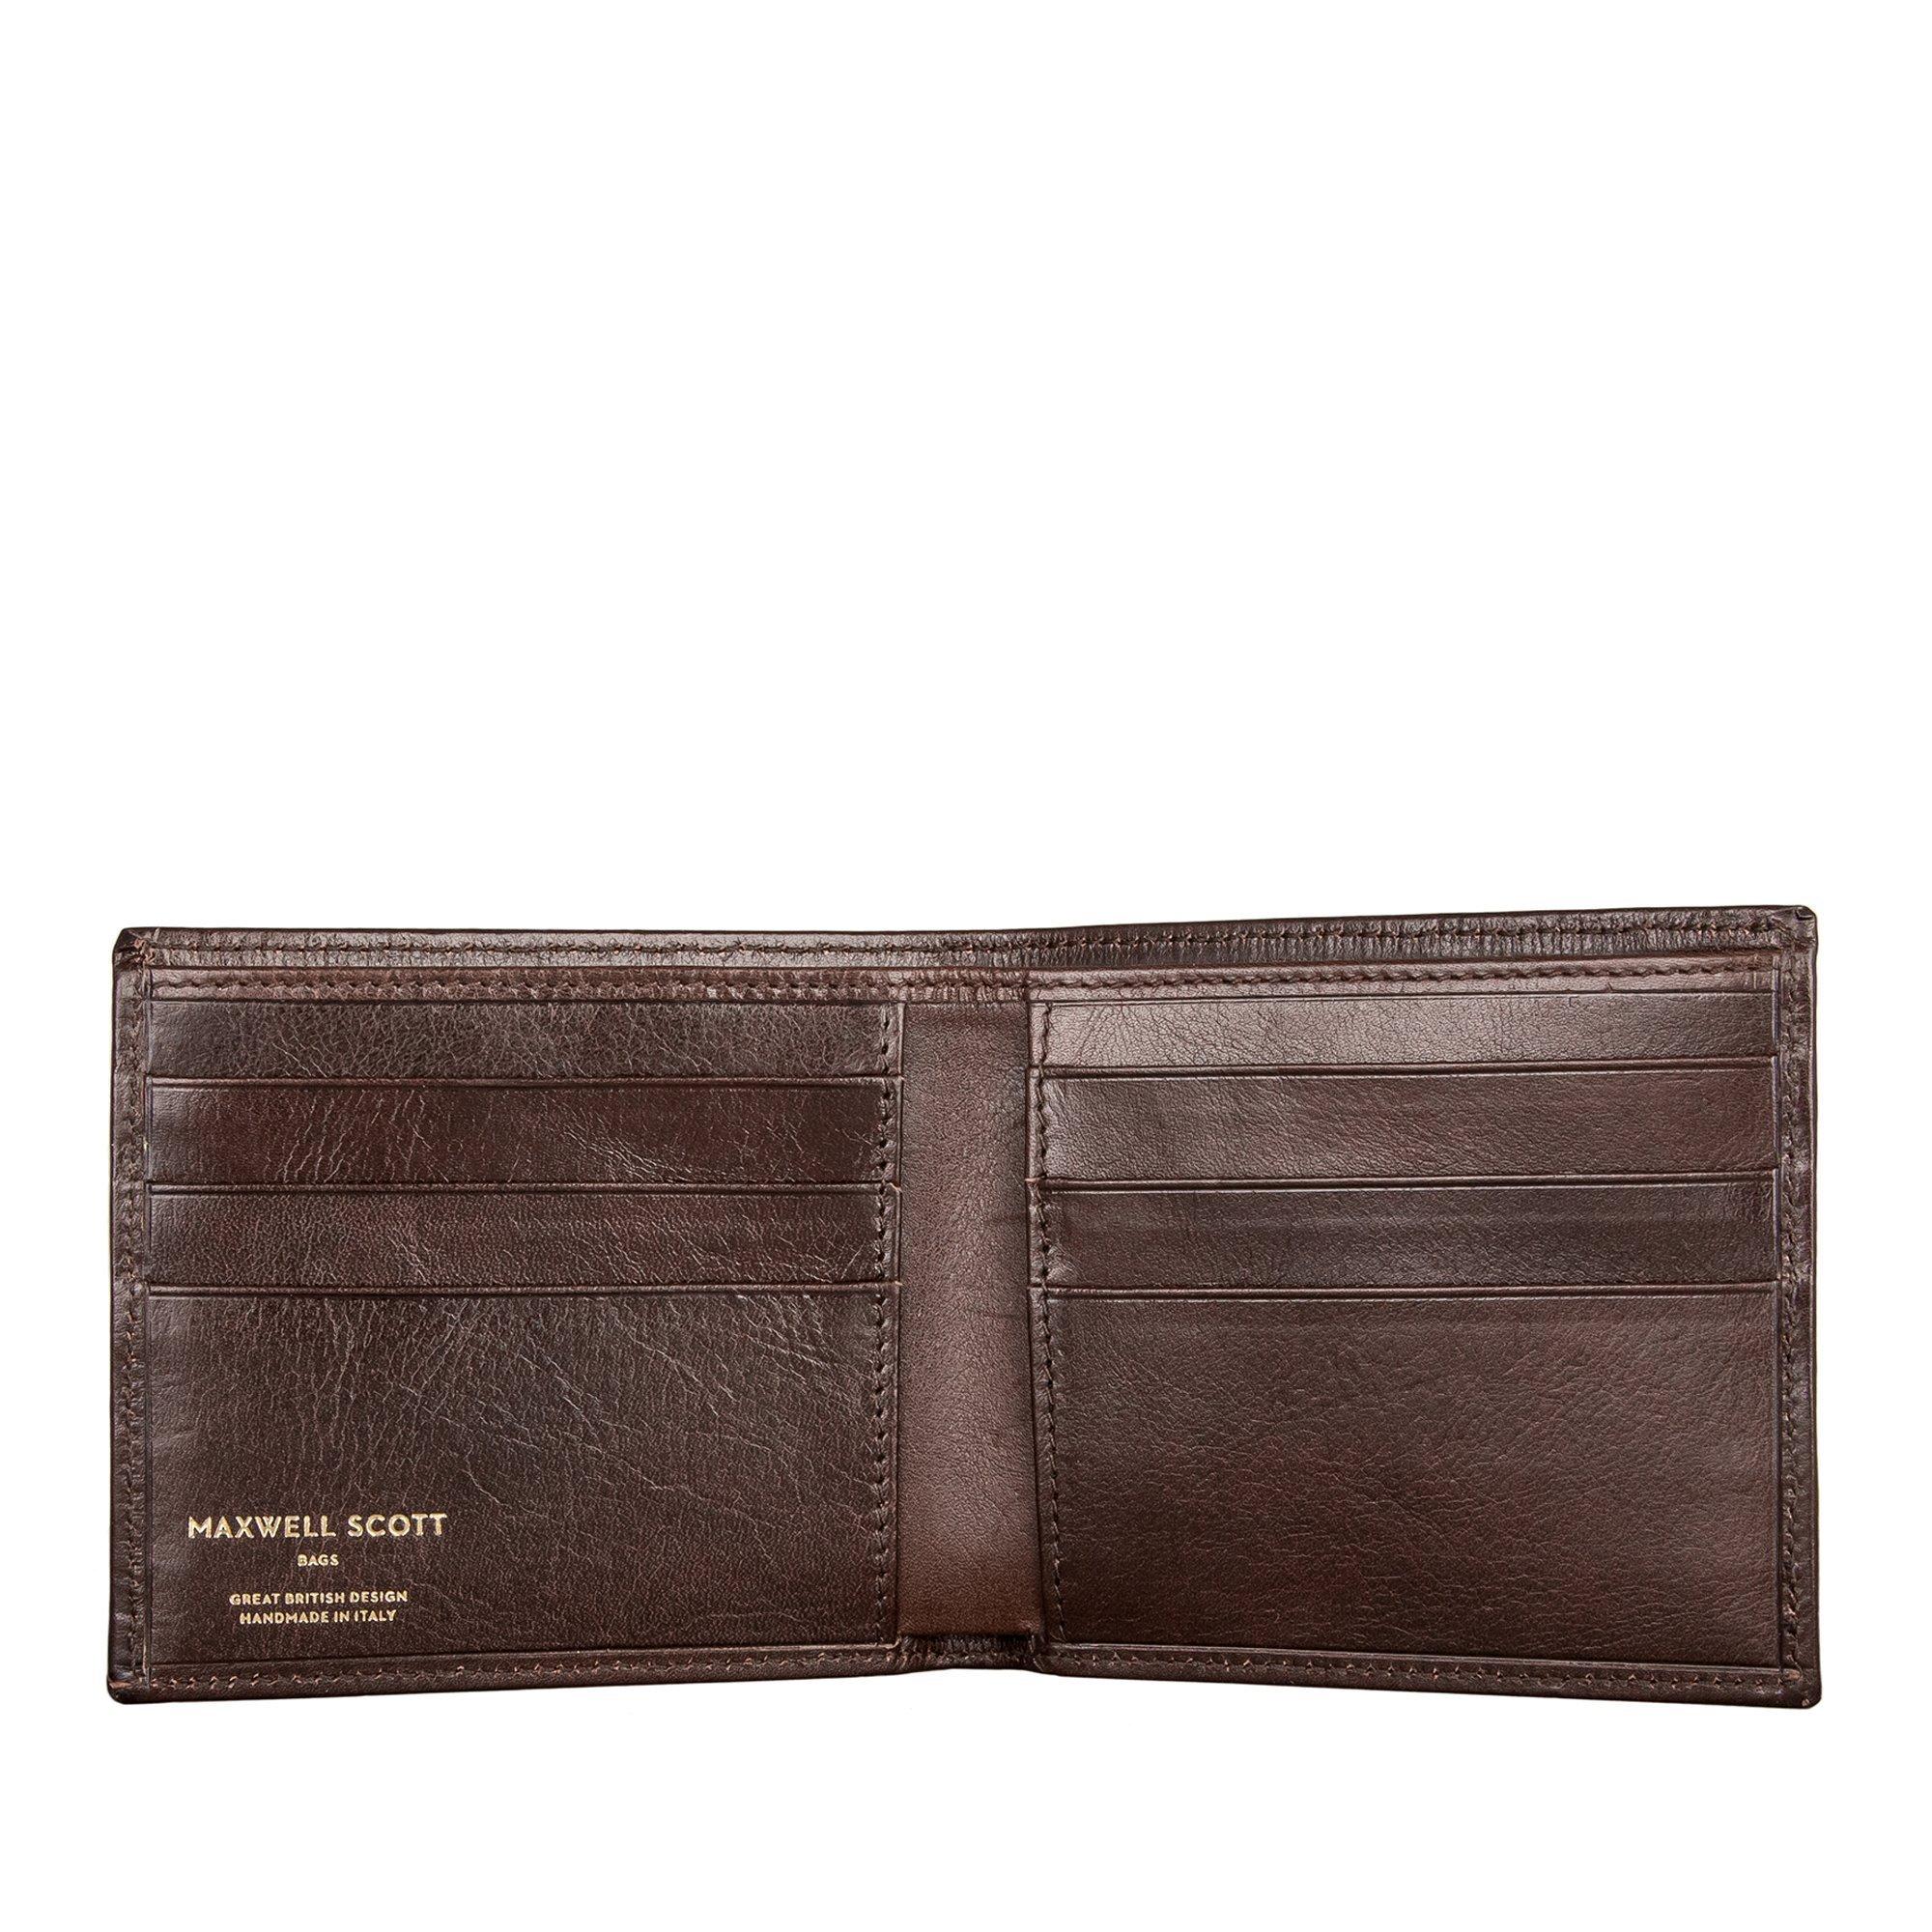 Maxwell Scott Luxury Dark Brown Leather Wallet - One Size (The Vittore)